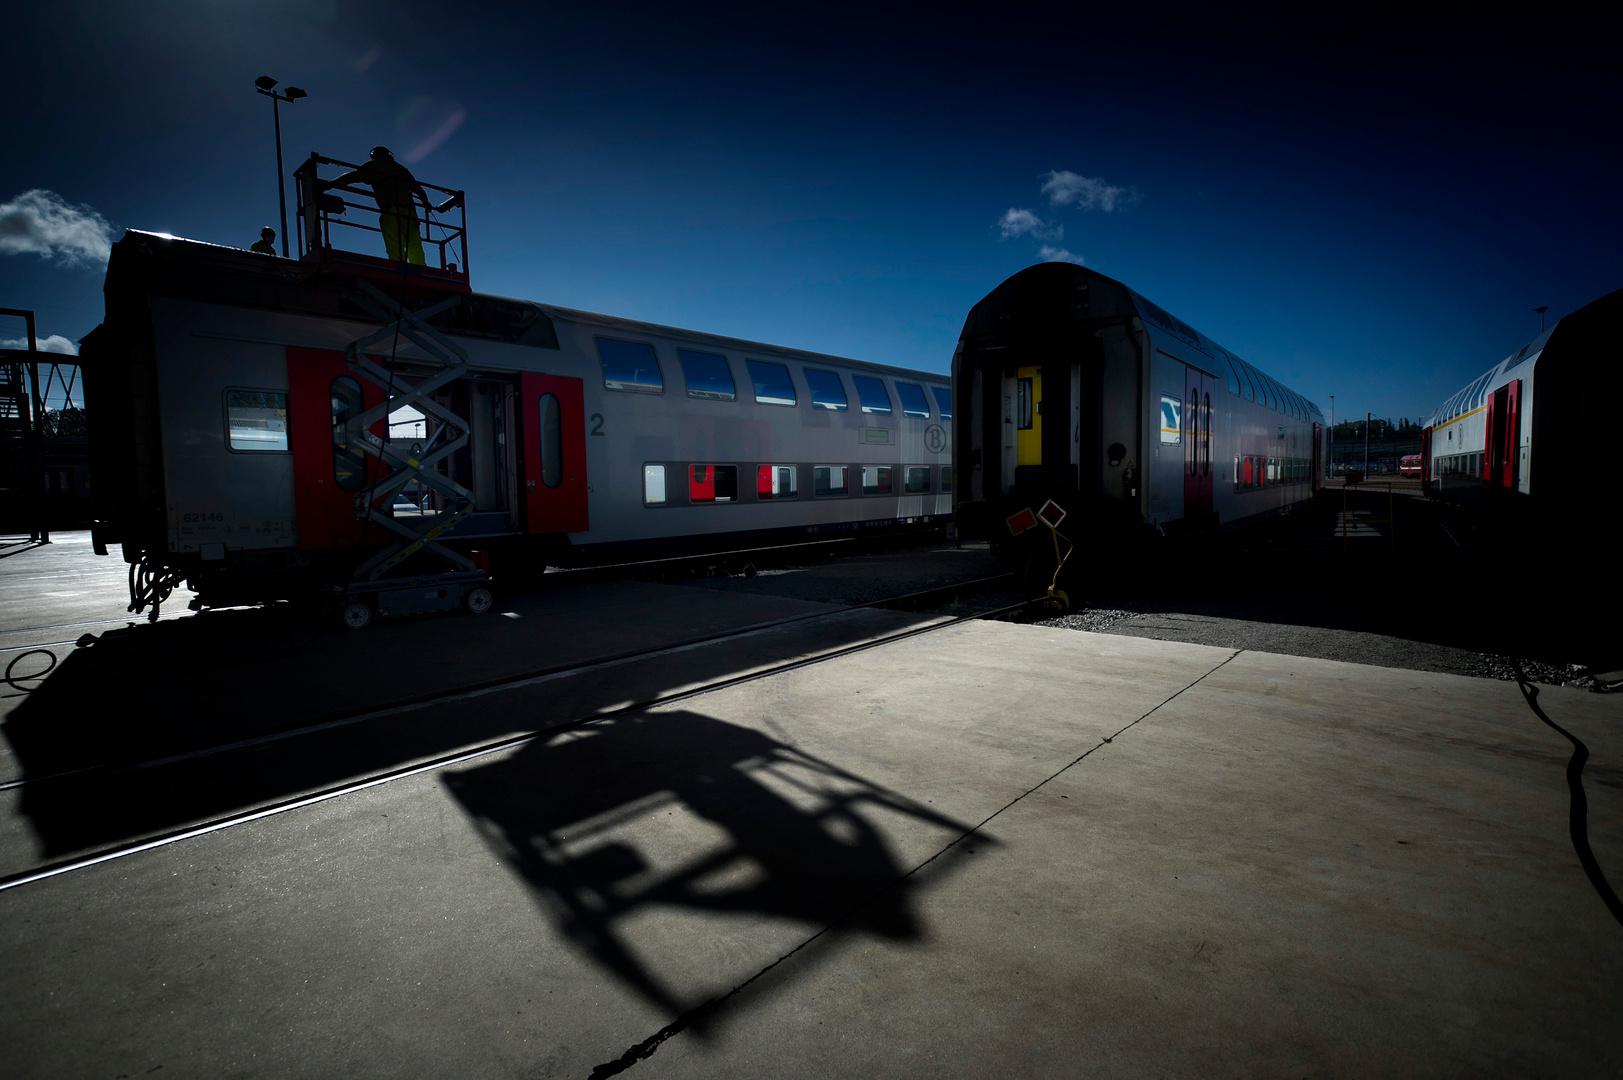 Reporters_h_110914_train_026.jpg